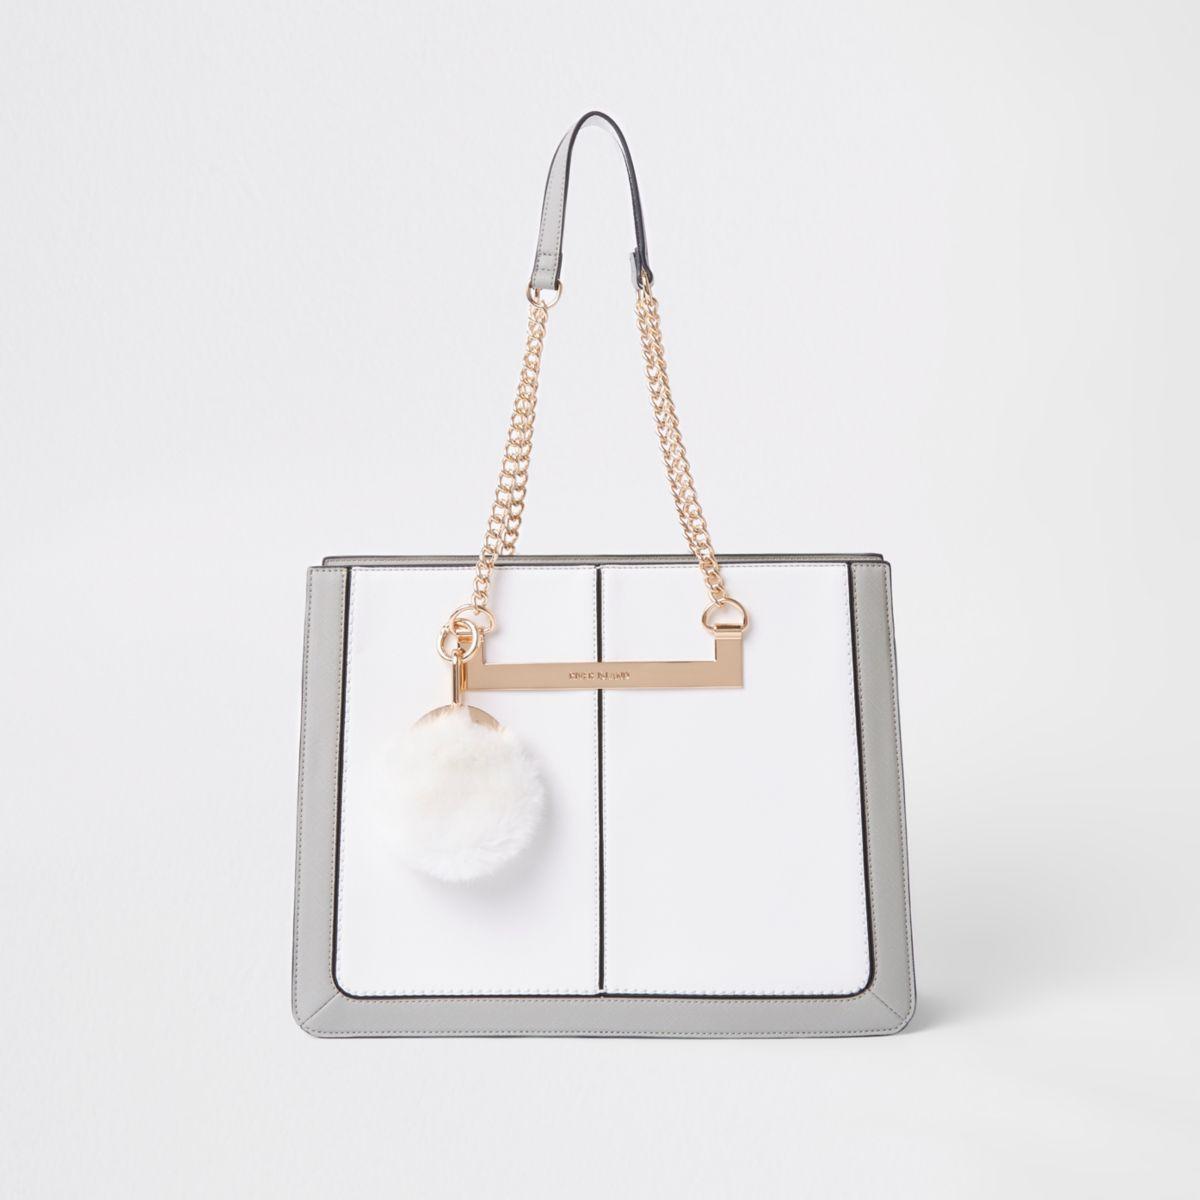 White chain handle pom pom tote bag